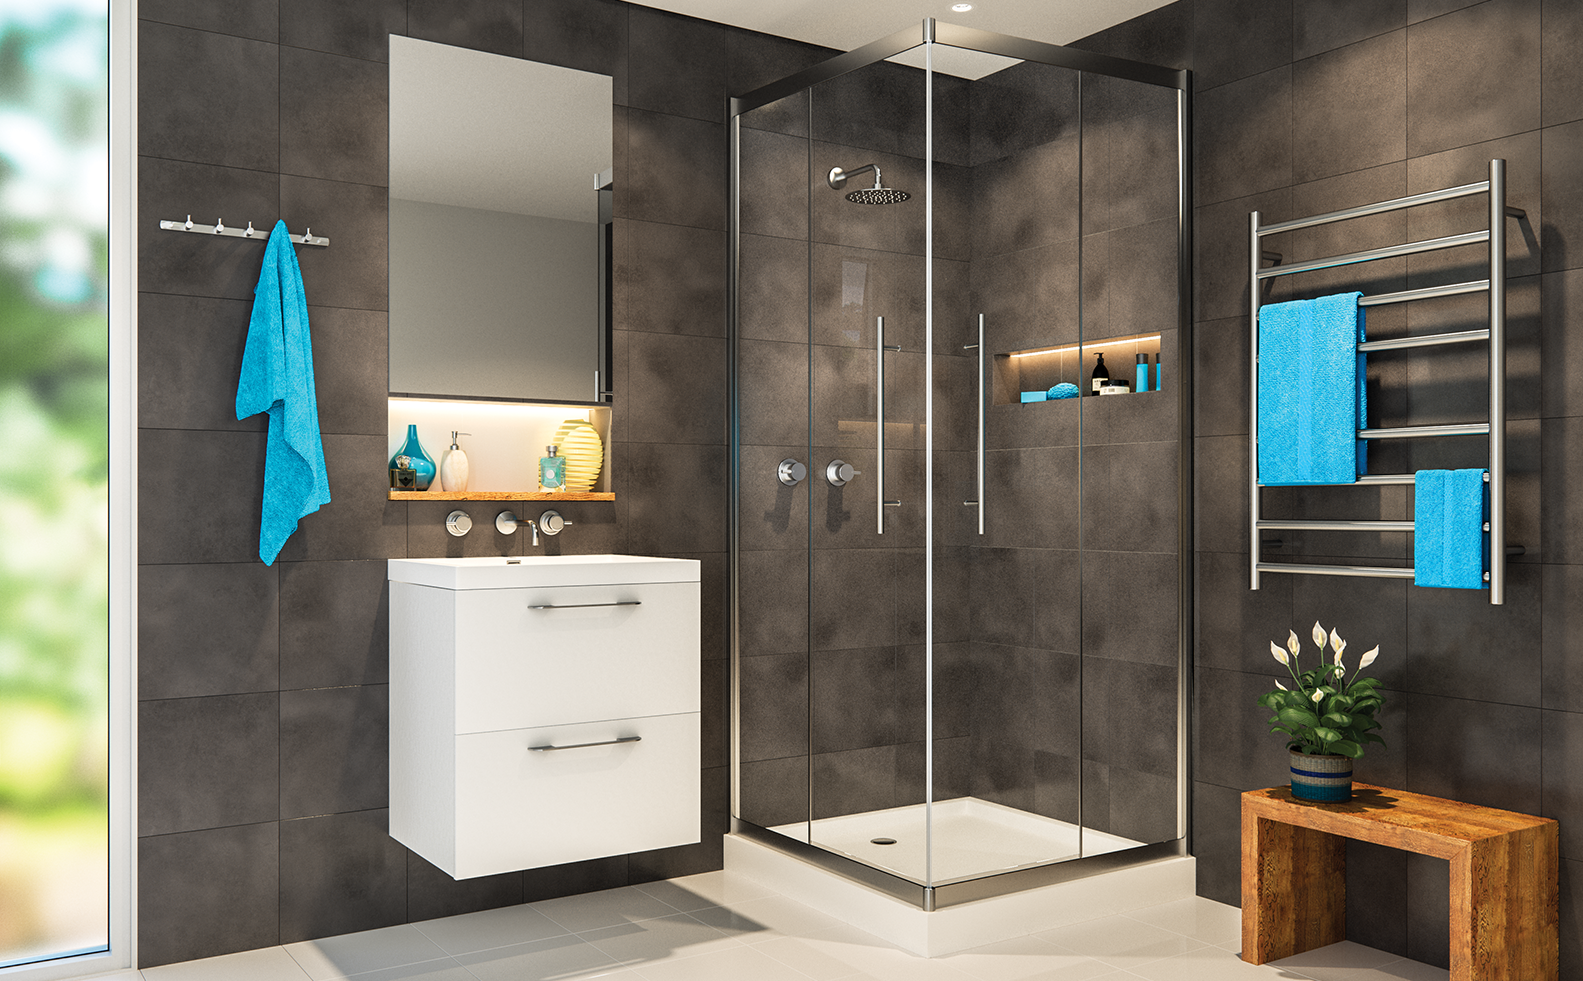 Bathroom Inspiration Gallery Bathroom collections